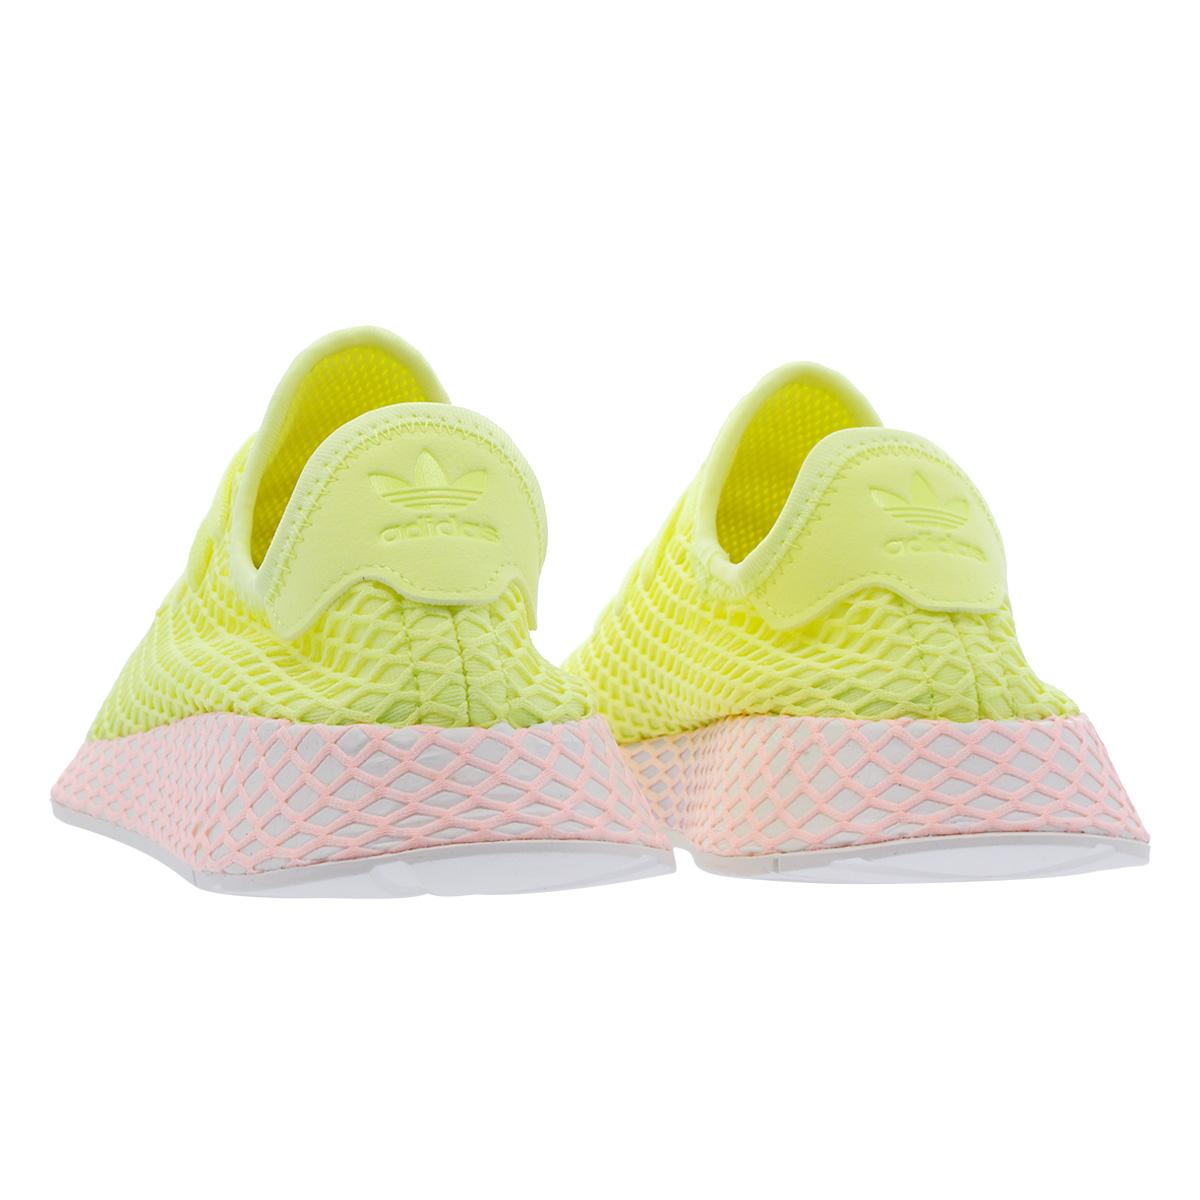 on sale 9bd38 15dbe adidas DEERUPT RUNNER W アディダスウィメンズディーラプトランナー GLOWGLOWCLEAR LILAC b37599